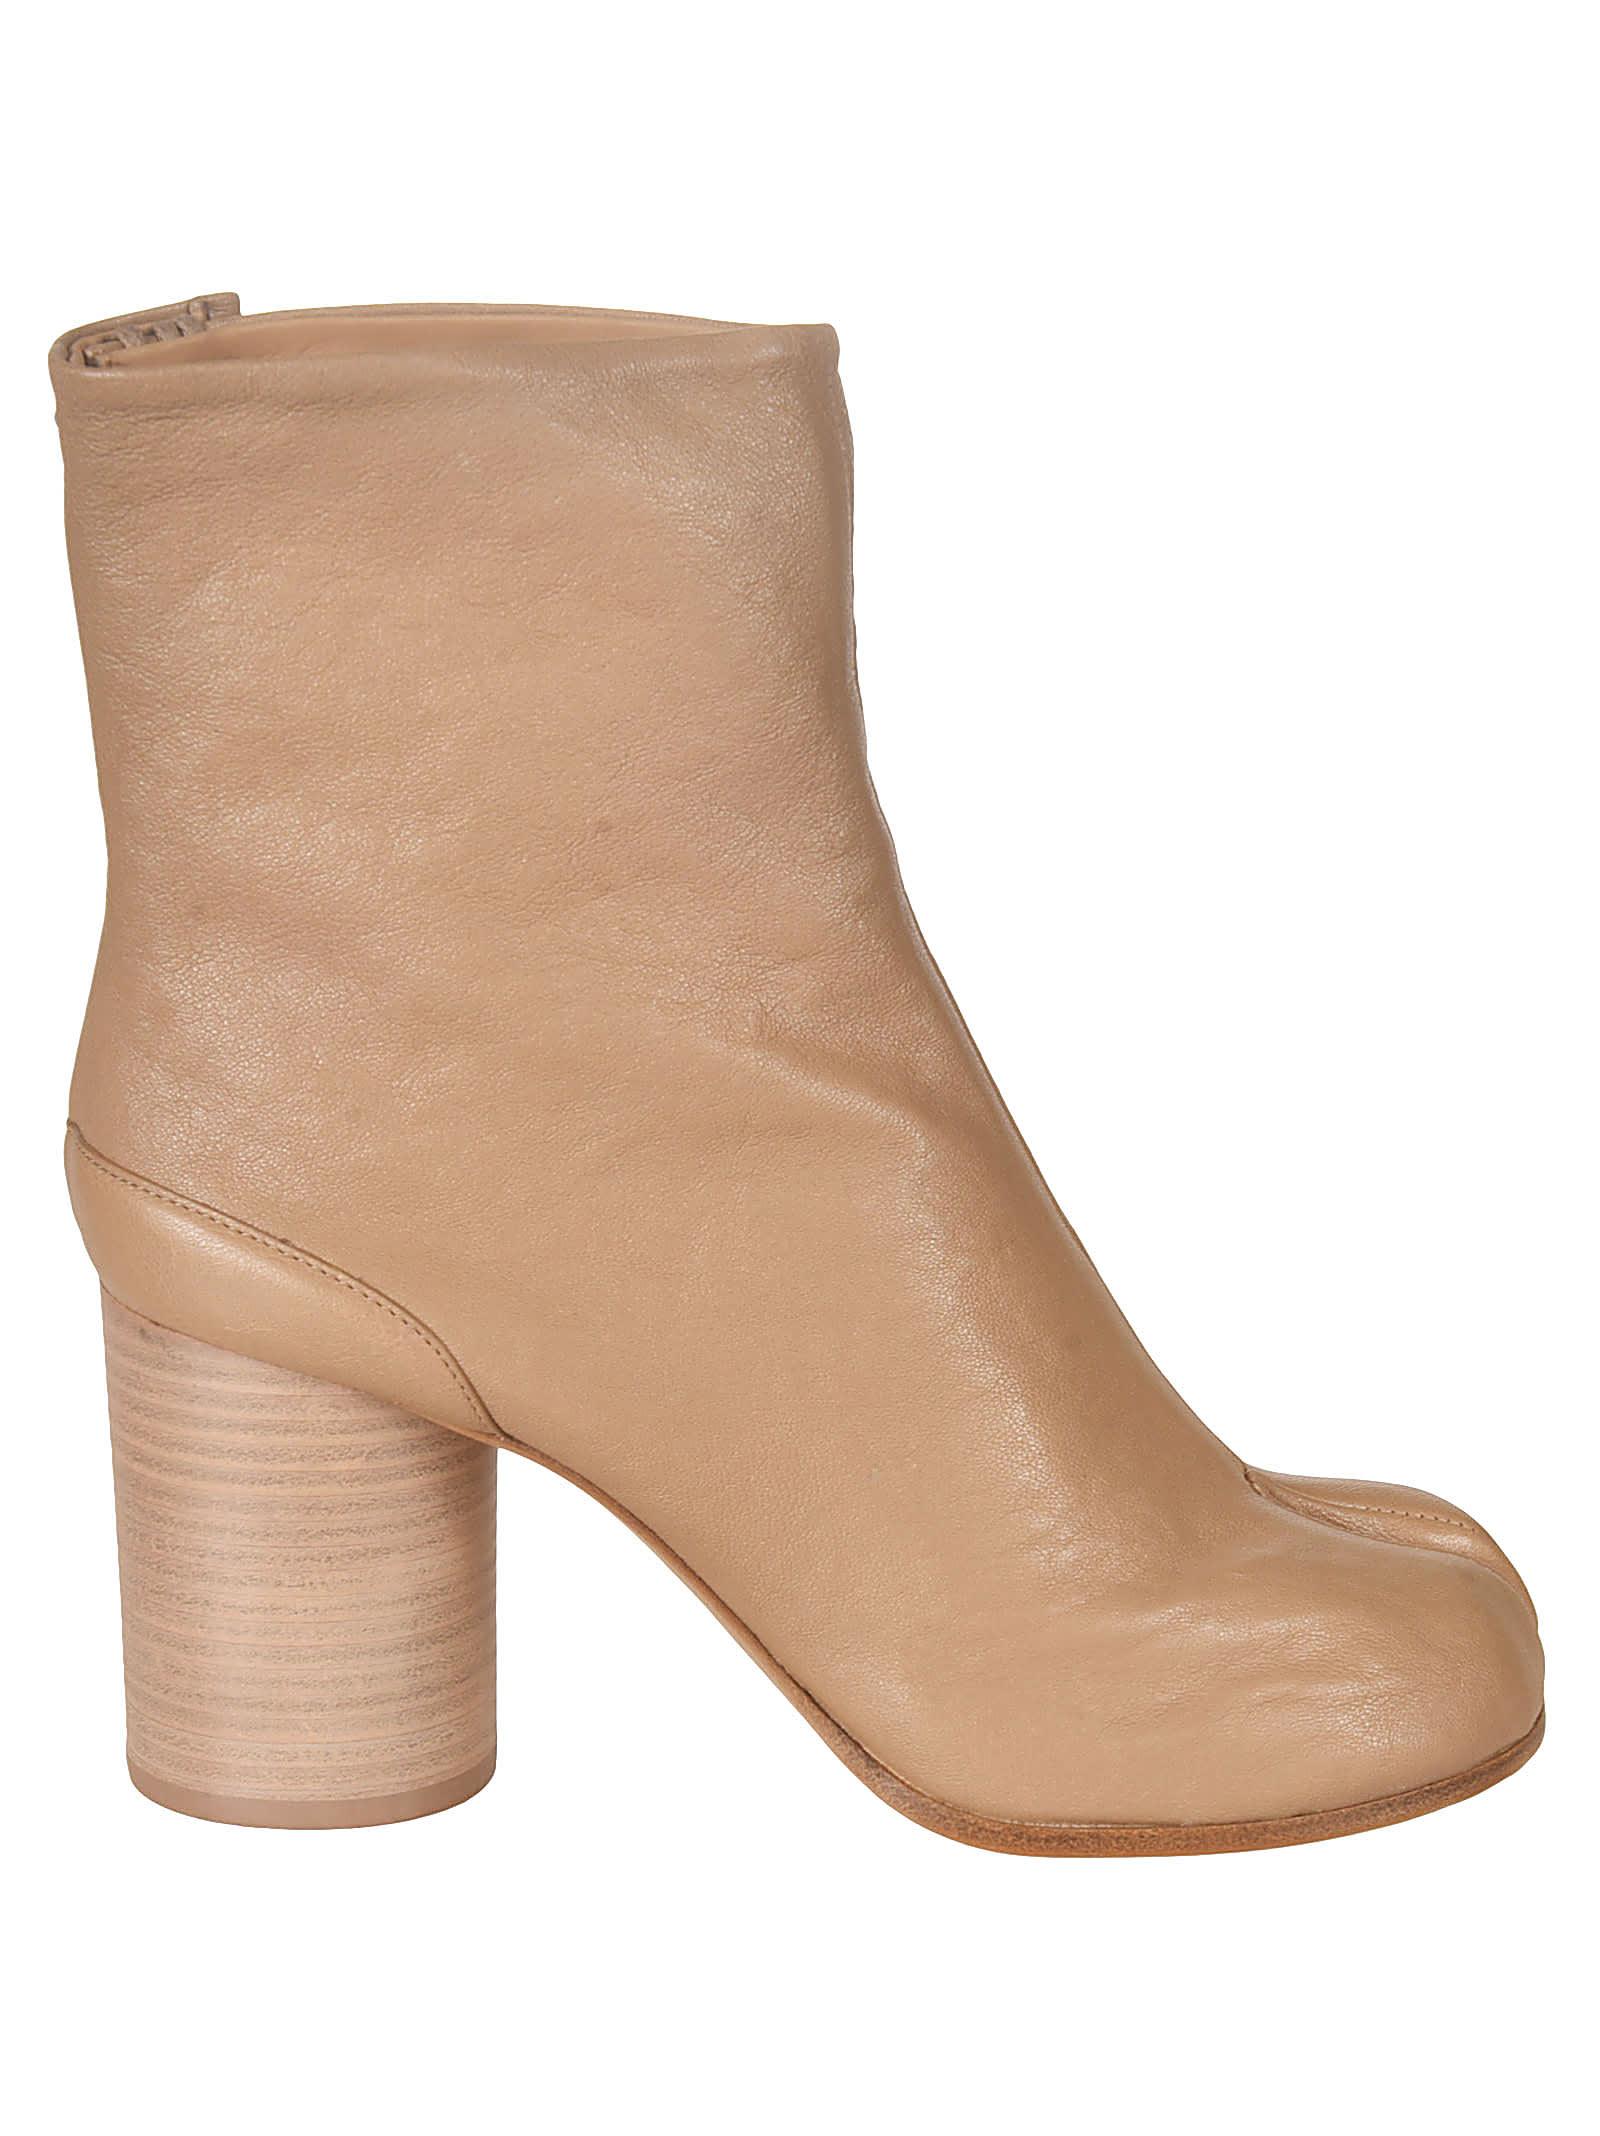 Buy Maison Margiela Block Heel Boots online, shop Maison Margiela shoes with free shipping